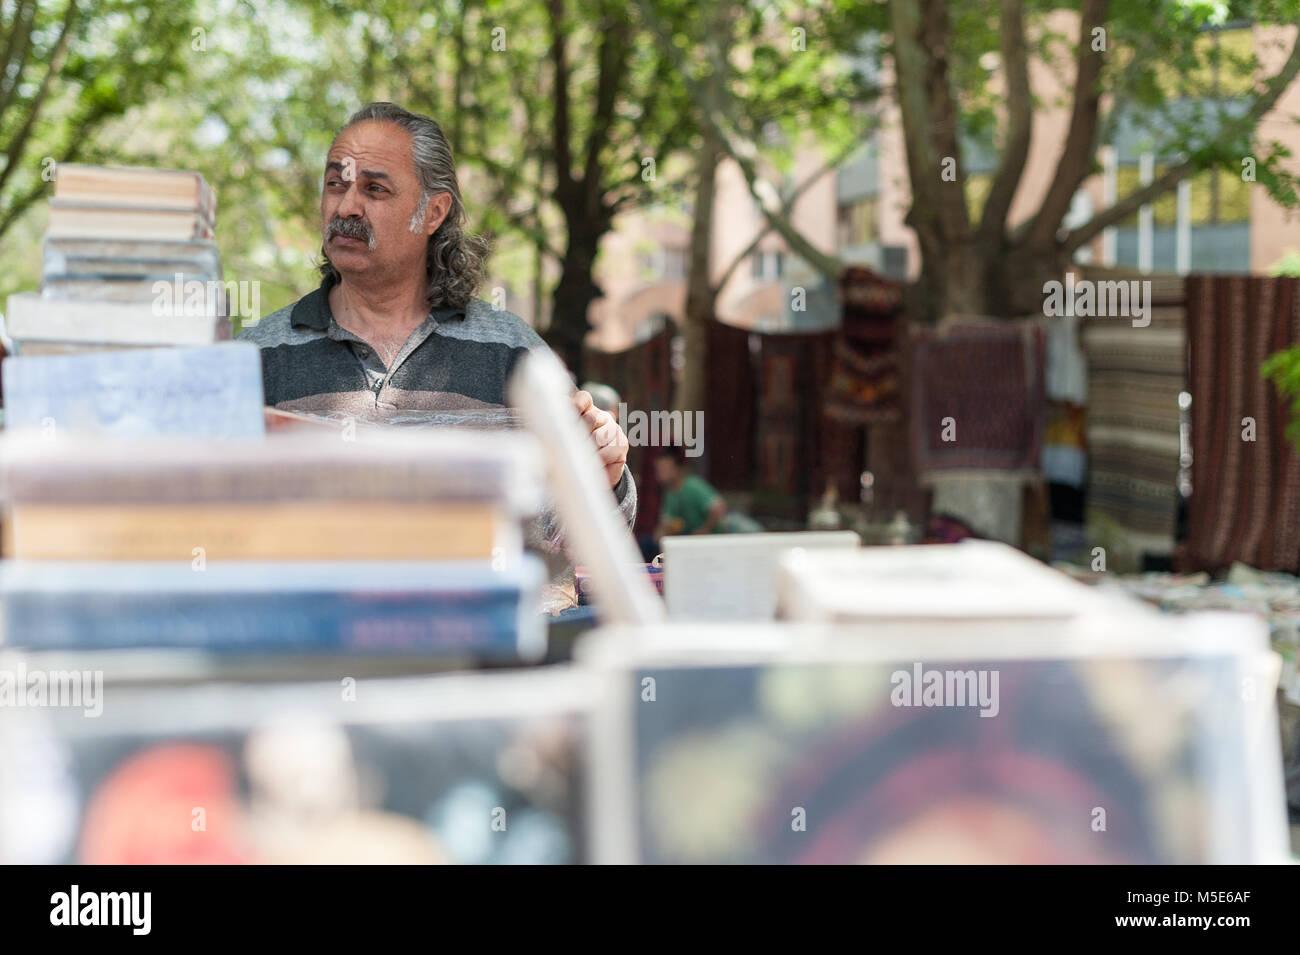 Book seller at the flea market in Yerevan,Armenia. - Stock Image